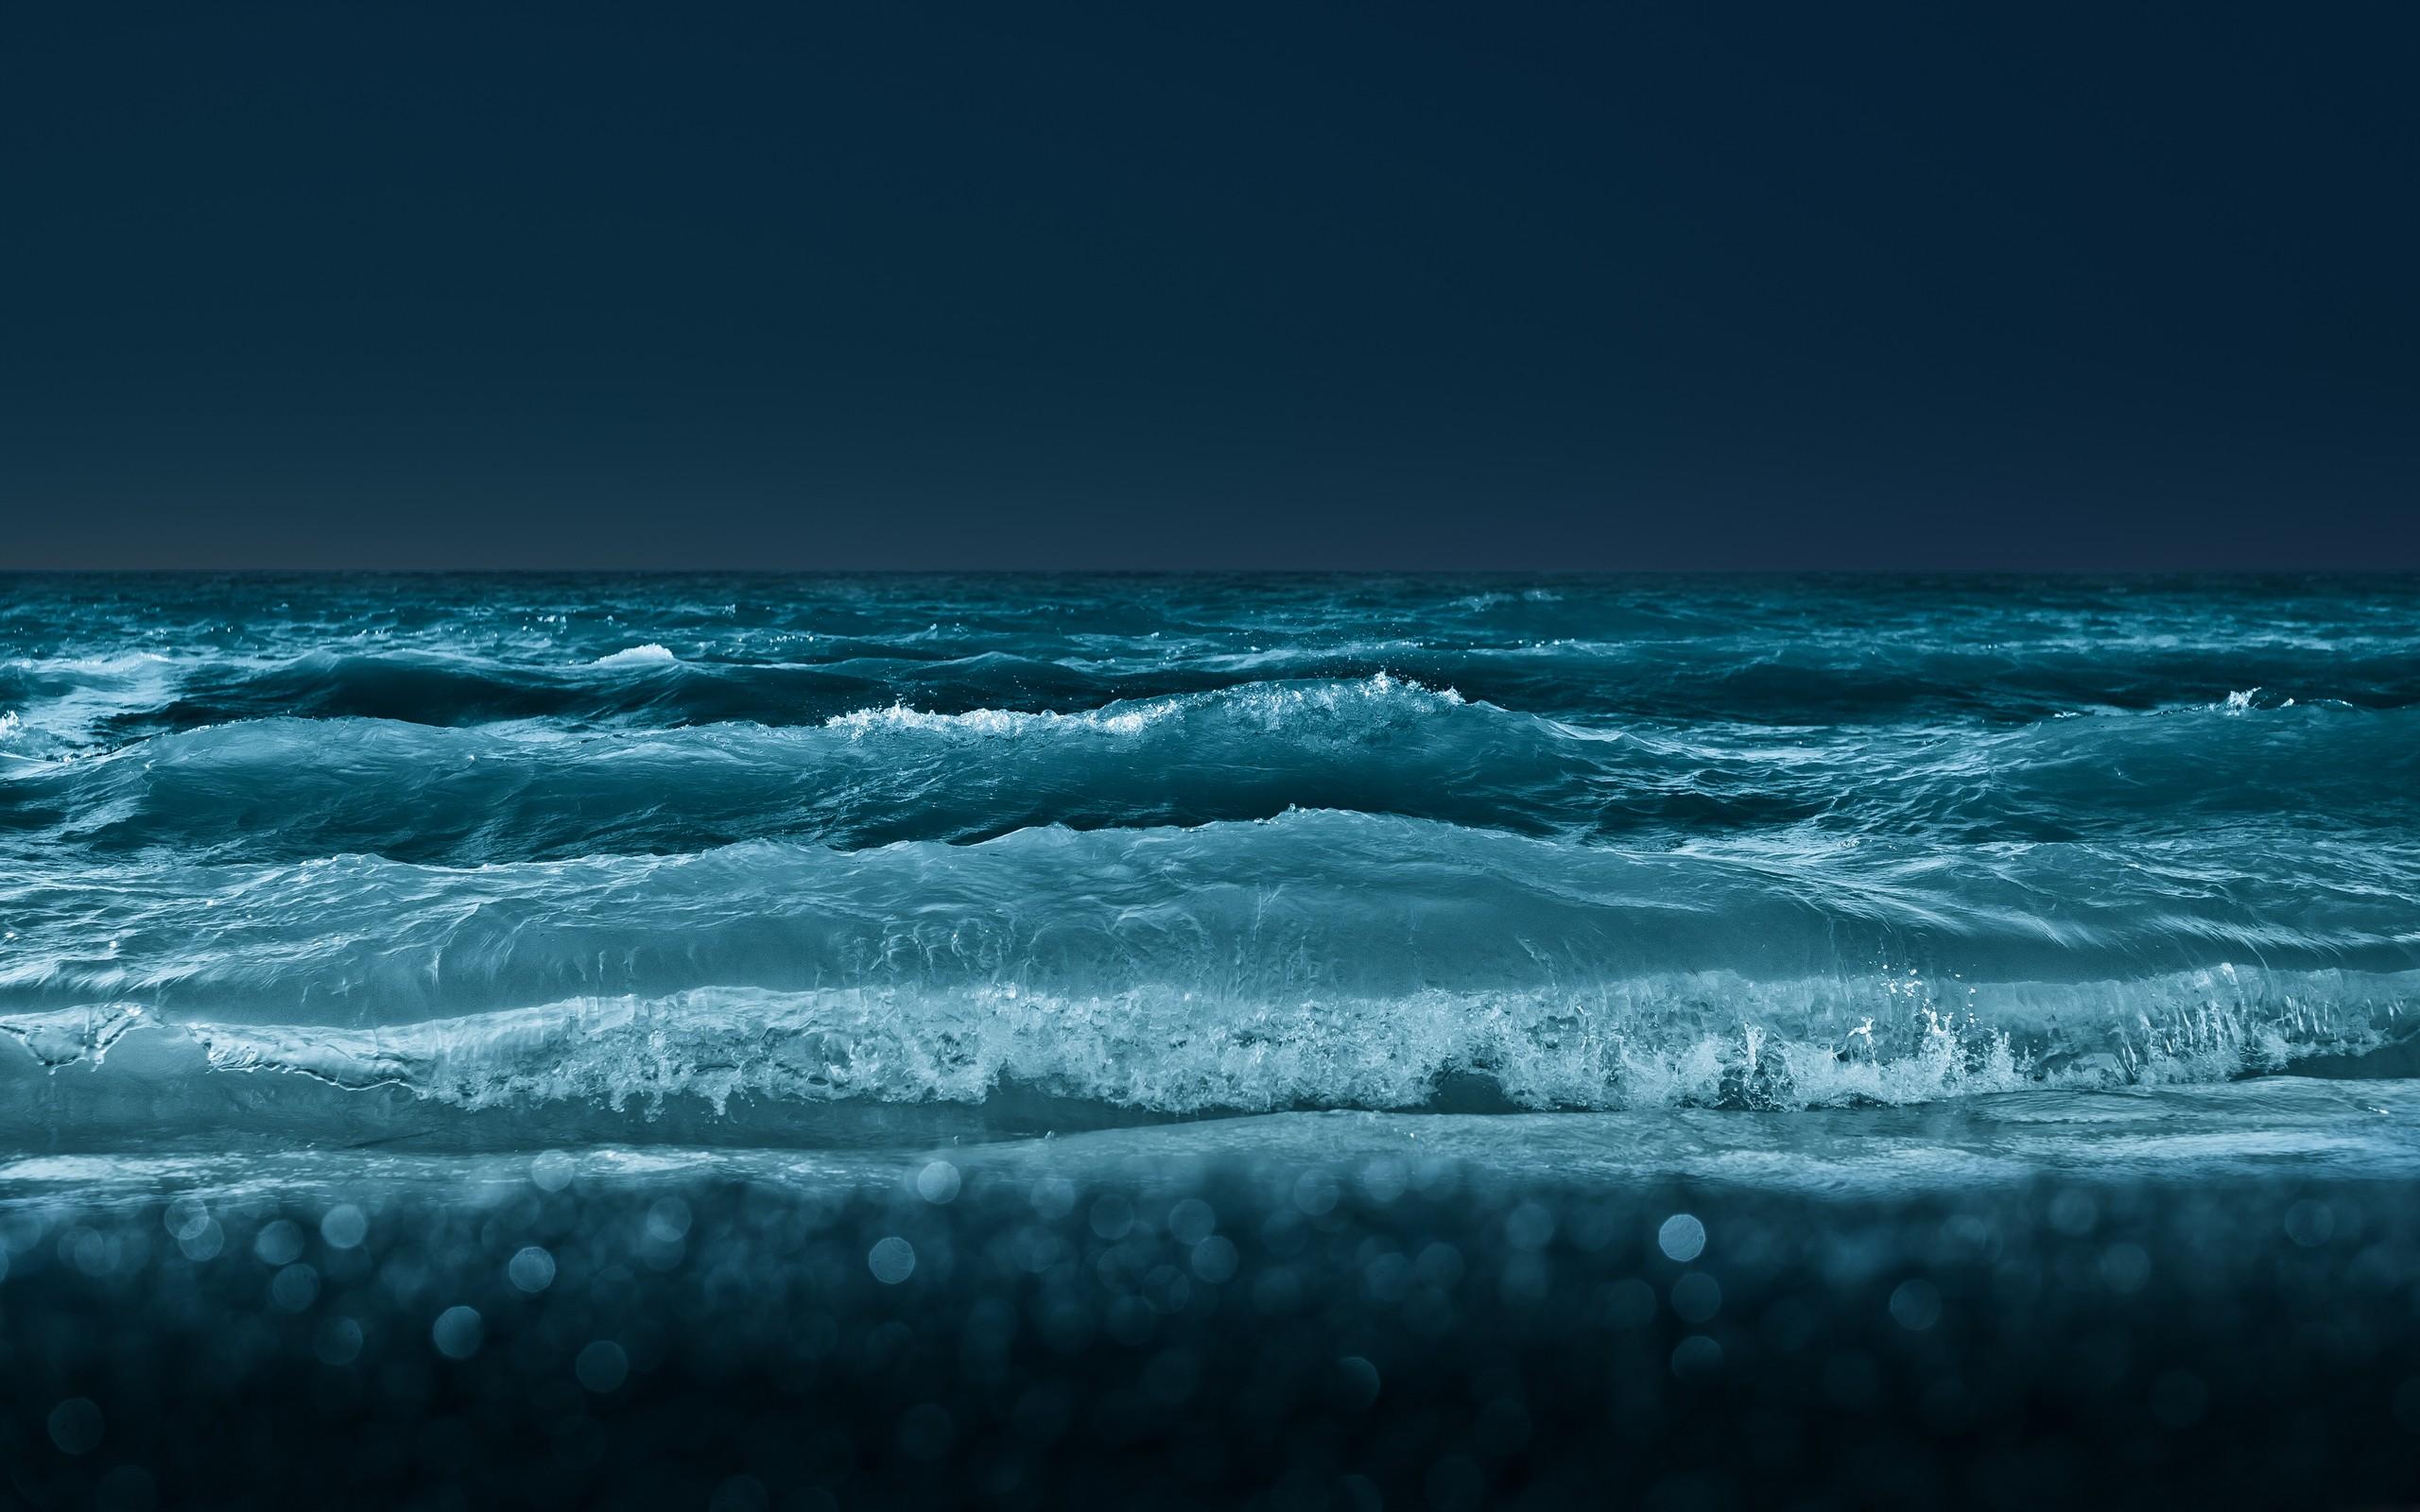 Water Ocean Wallpaper 2560x1600 Water Ocean Nature Night Waves 2560x1600